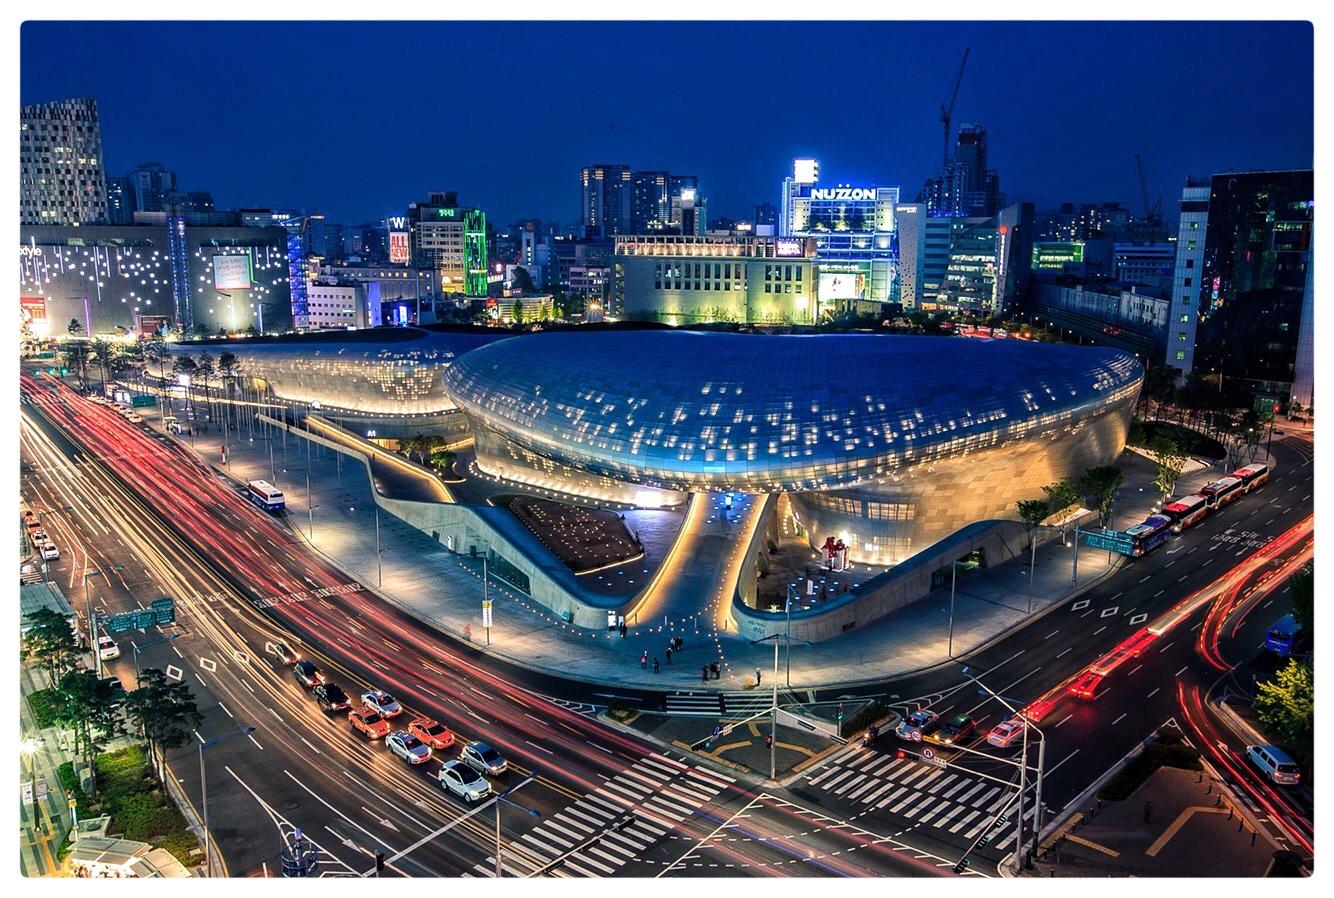 Seoul%2BPackage%2B%25282%2529.jpg